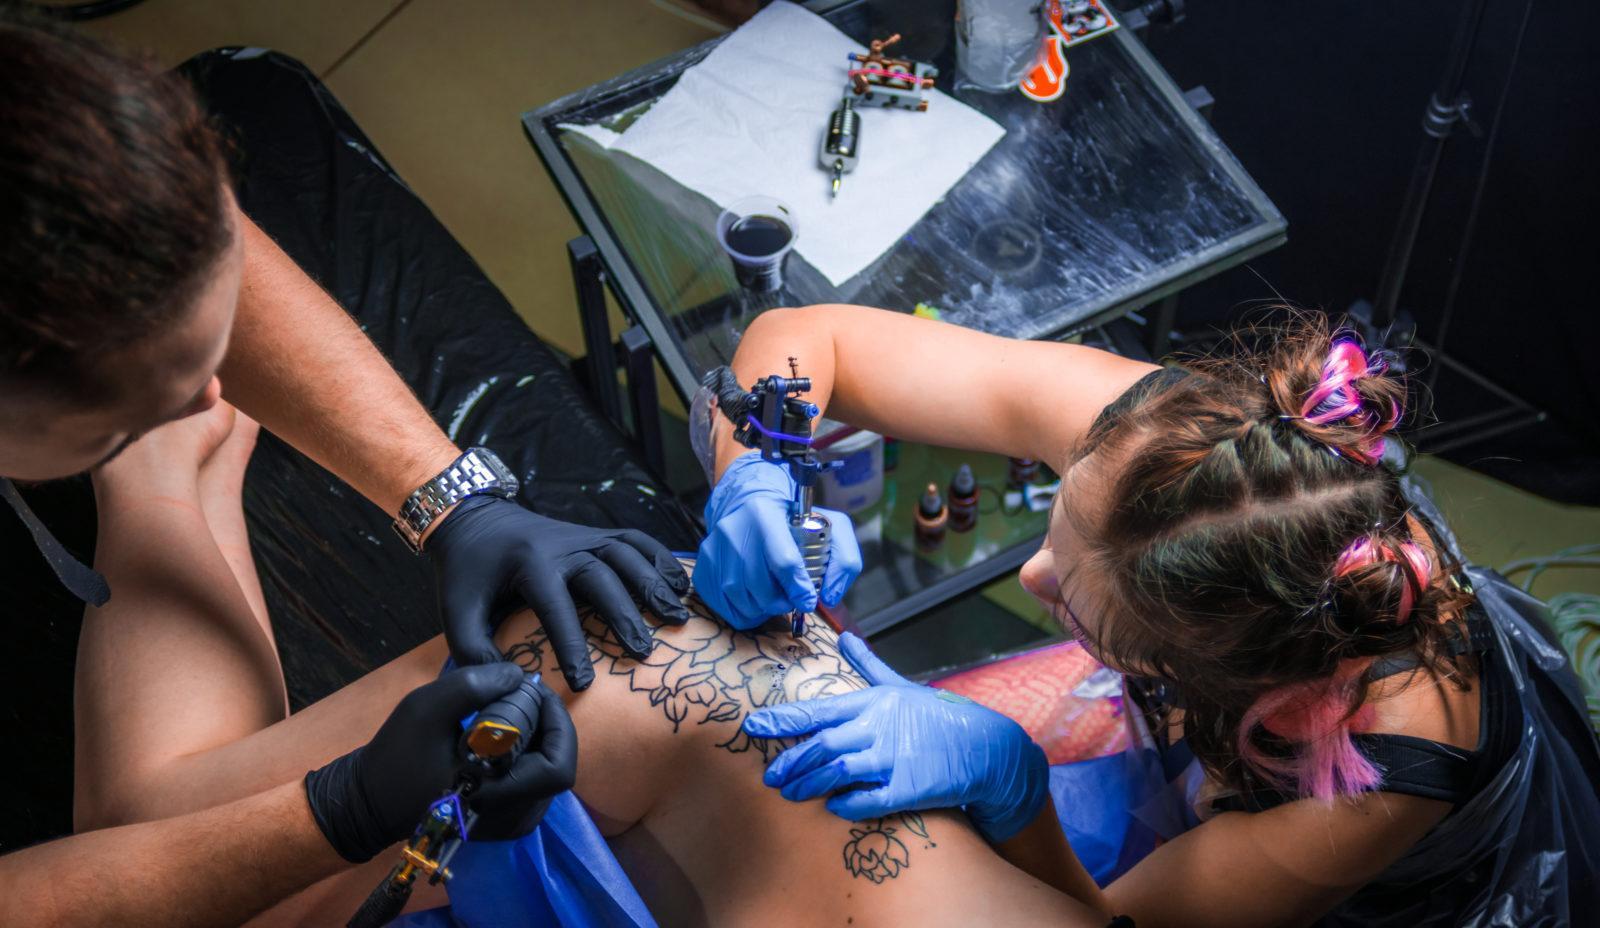 Мастера салона тату наносят изображение на кожу. Город Пенза